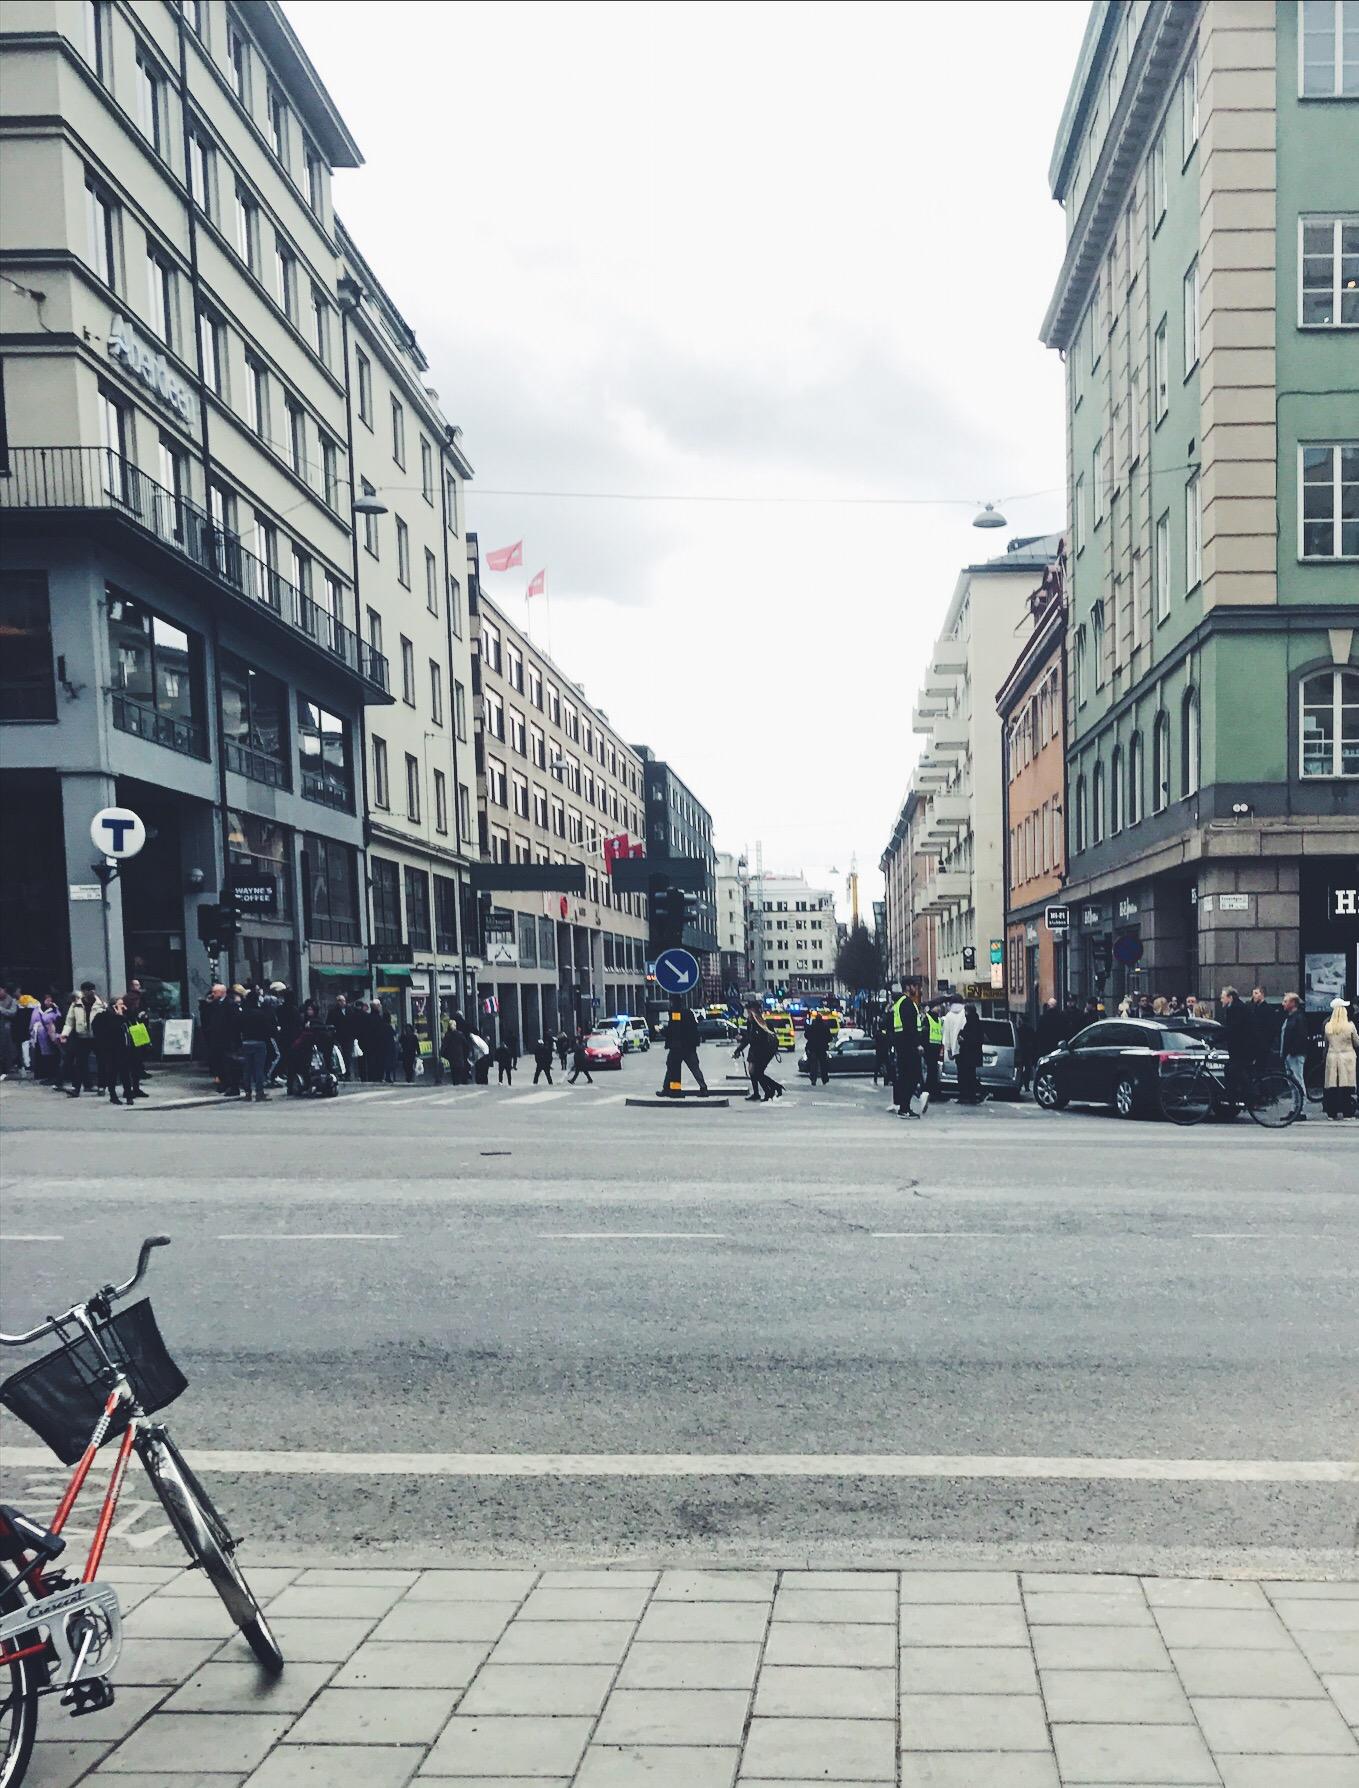 #prayforstockholm